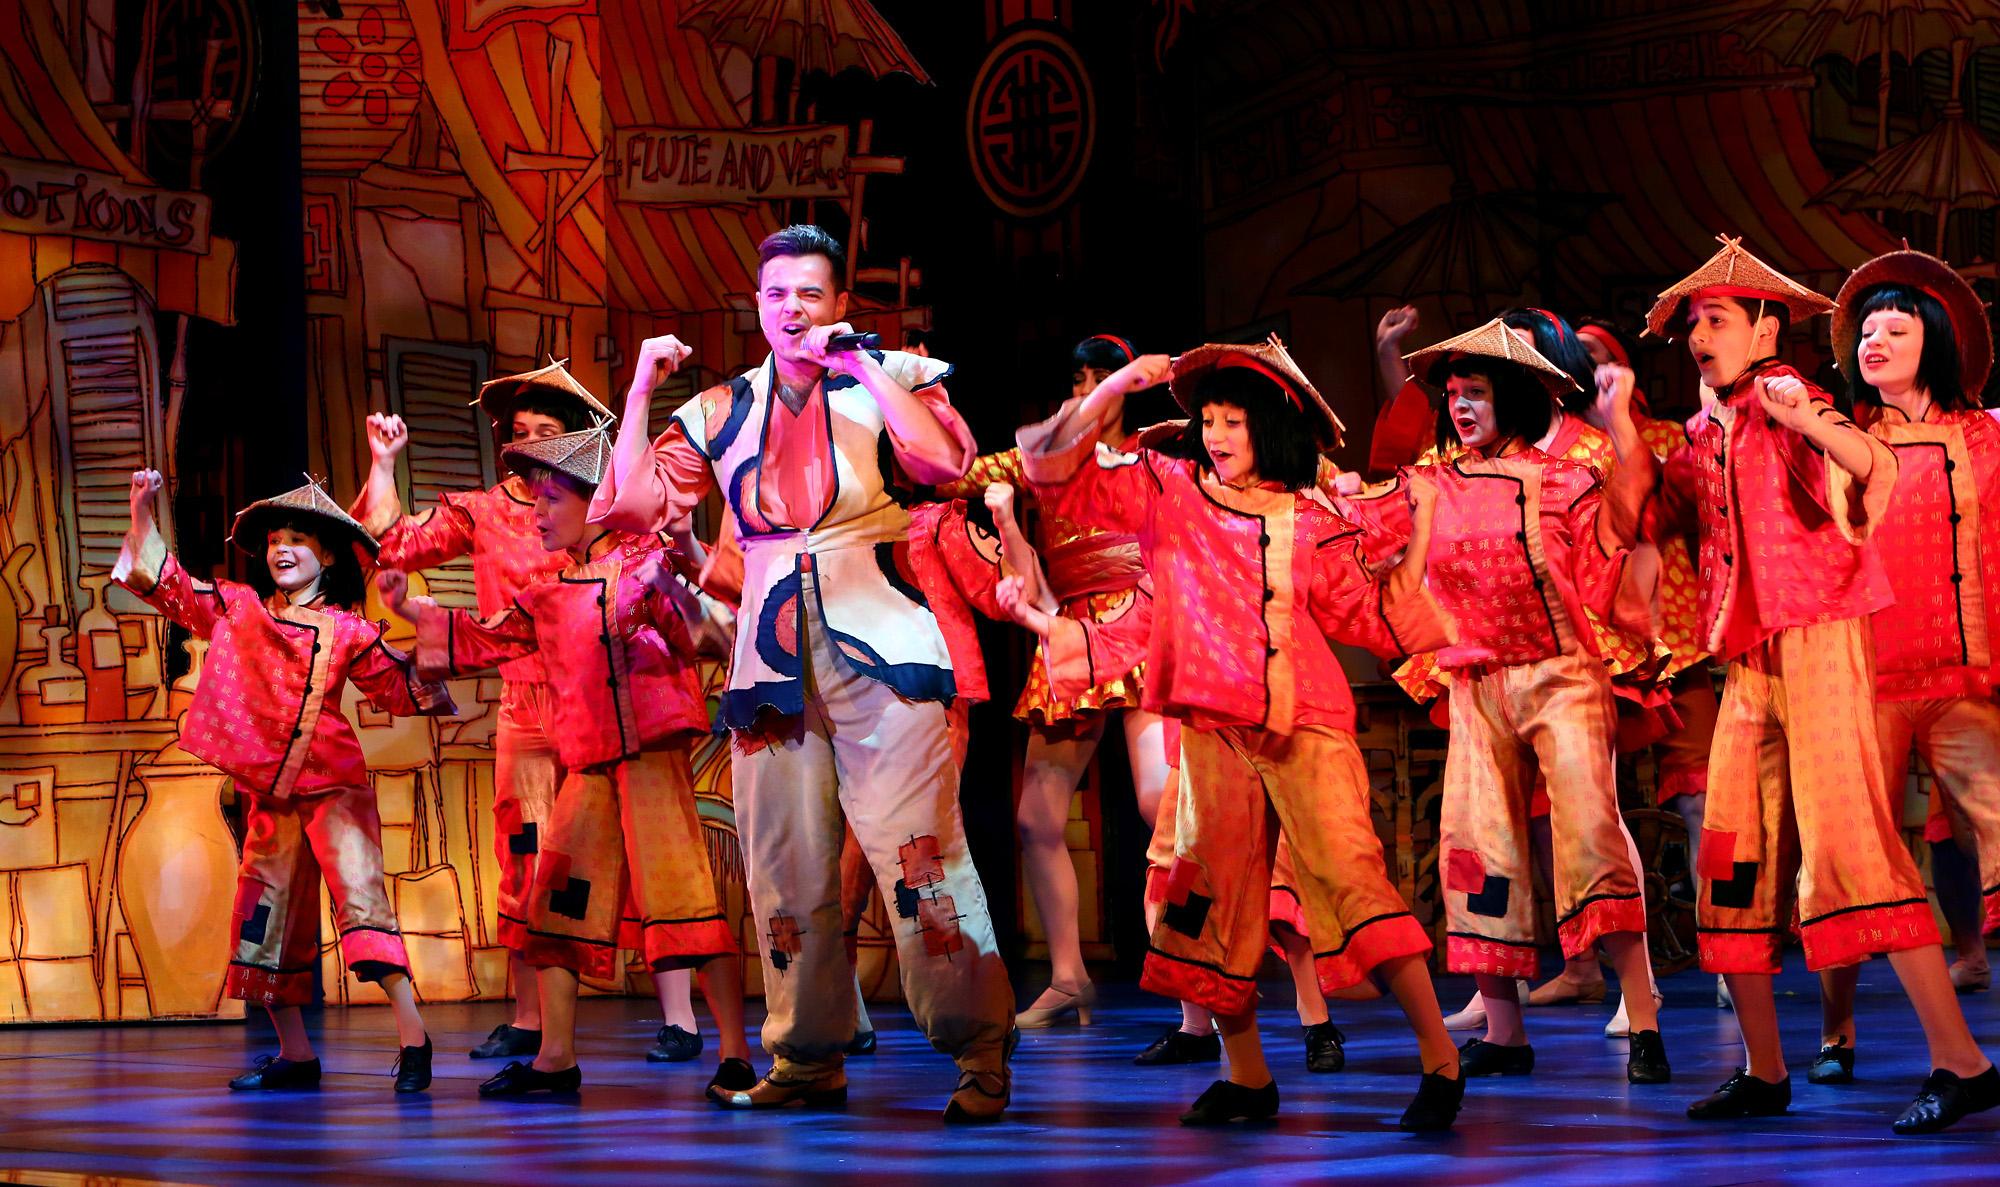 Aladdin. Ben Adams. Milton Keynes Theatre pantomime, Christmas 2015. Aladdin stars Priscilla Presley, Gary Wilmot, Ben Adams, Wayne Sleep, Kev Orkian, Mark Pickering, Aimie Atkinson and Phil Holden.